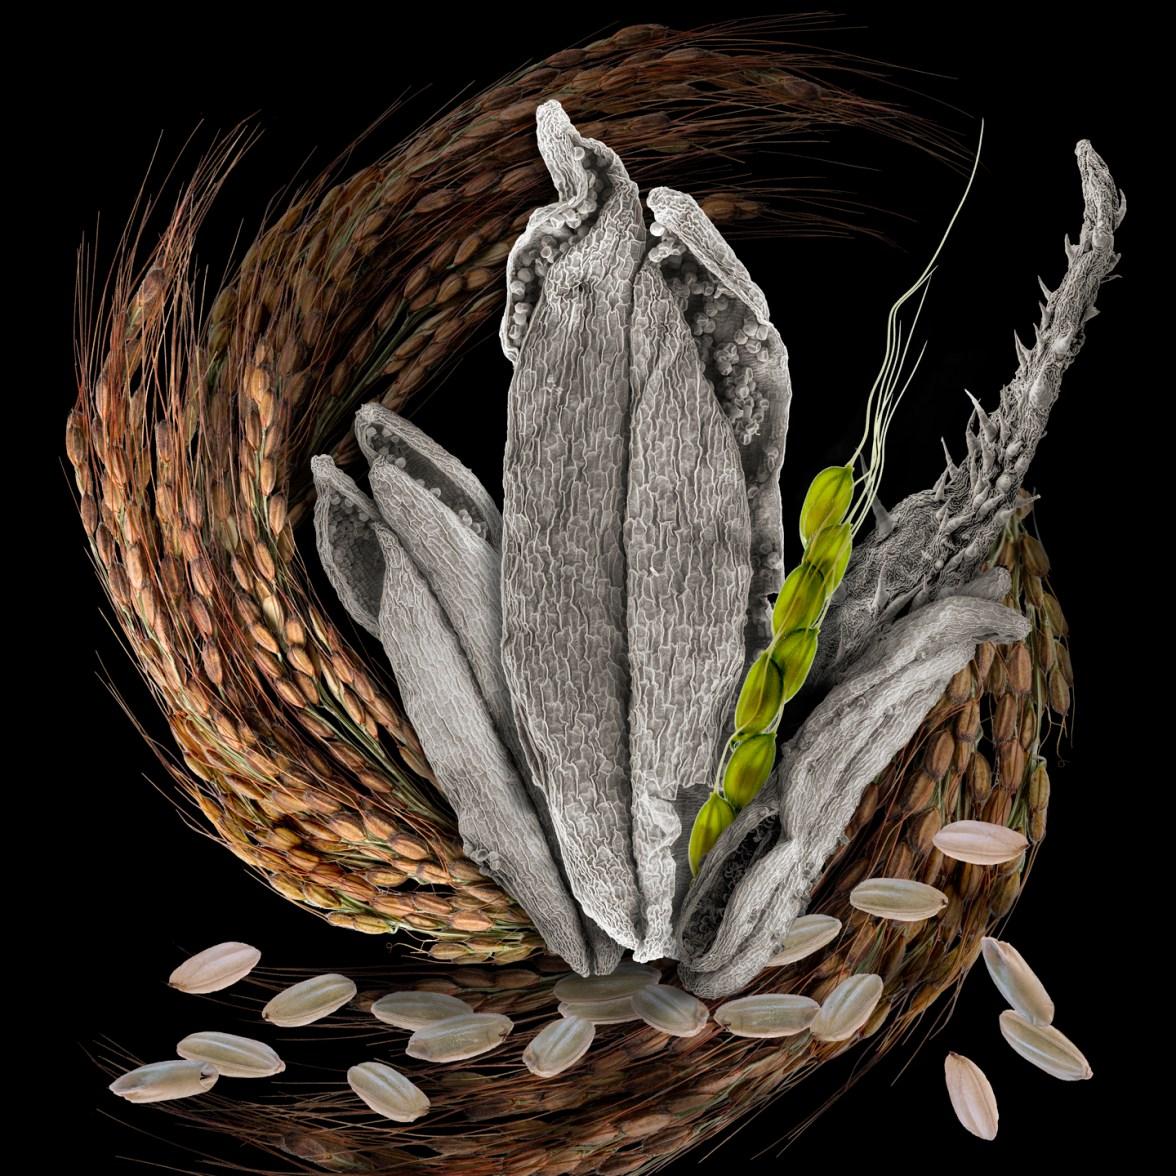 Lifecycle Rice © Robert Dash